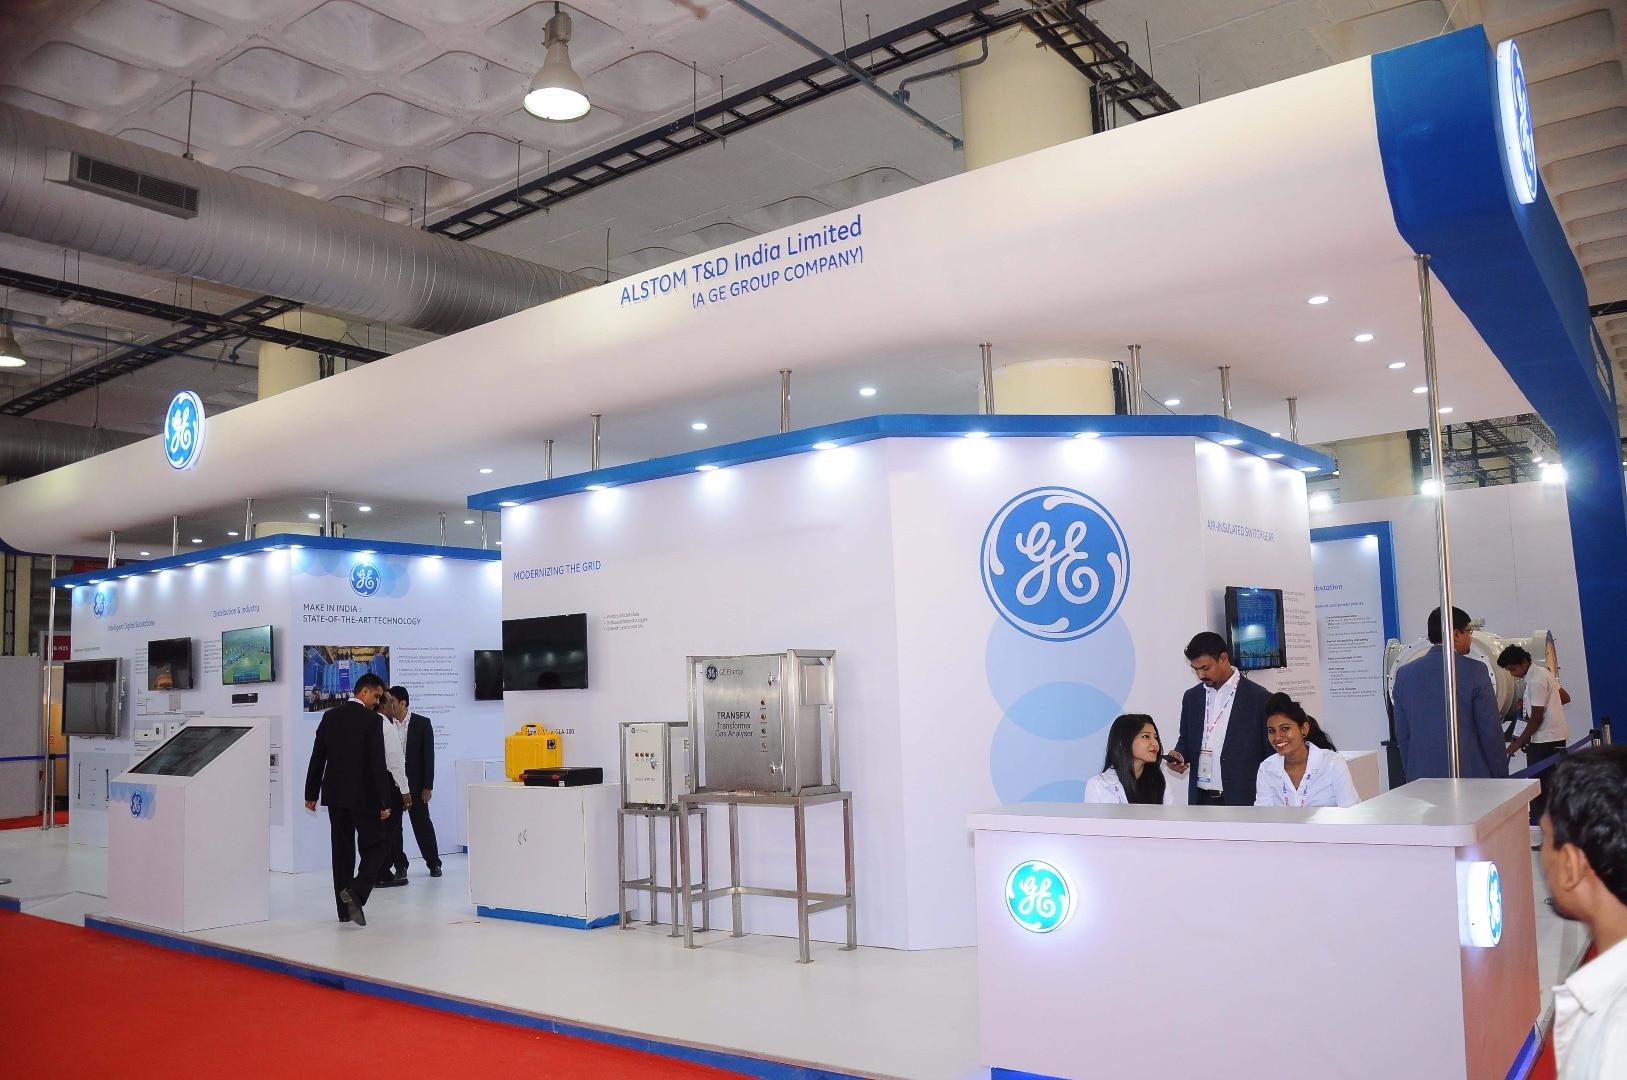 Ngenius Brand Interactions Pvt Ltd